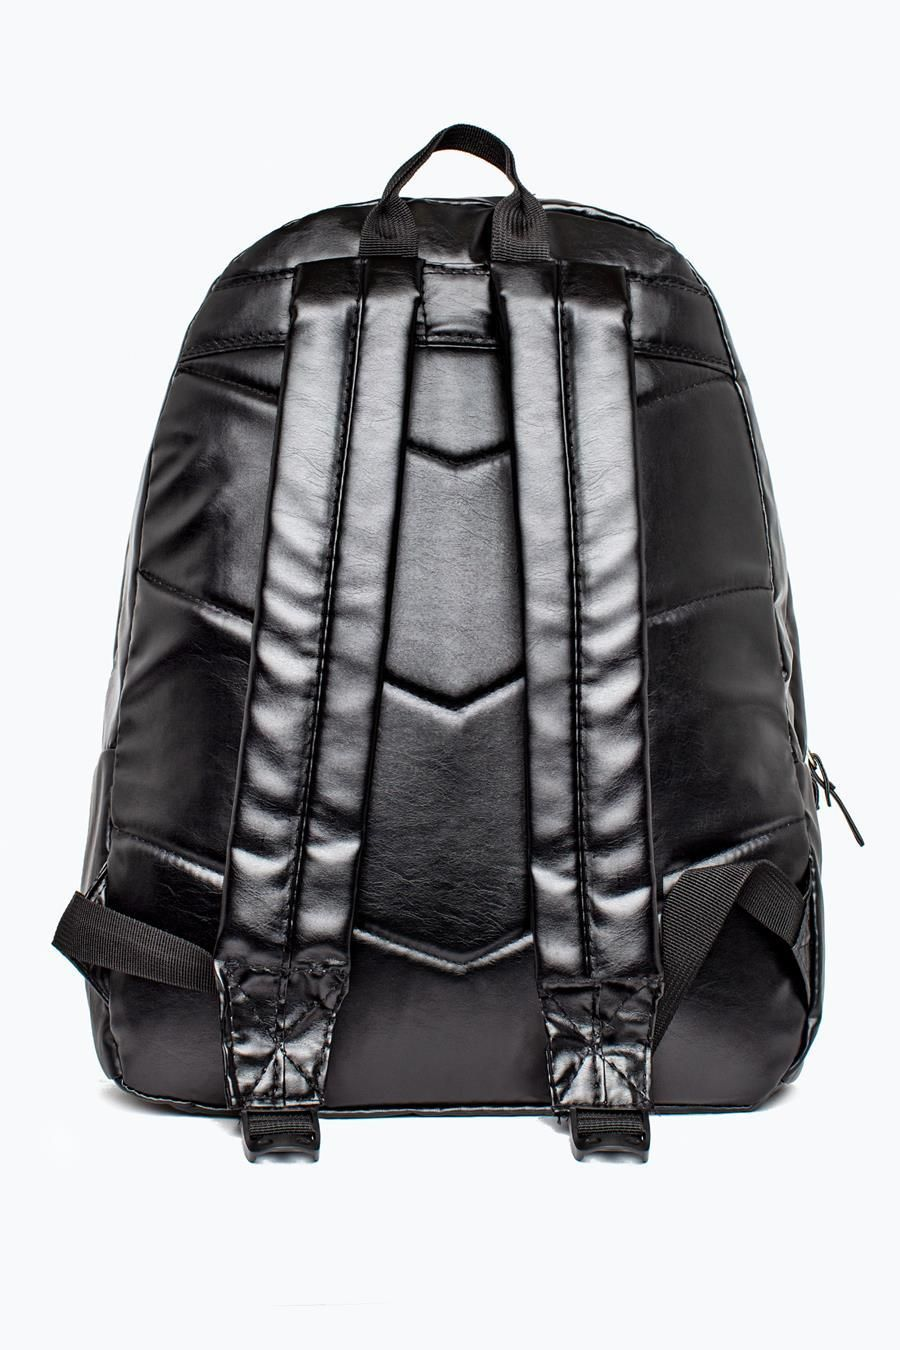 Hype Black Phantom Holographic Backpack